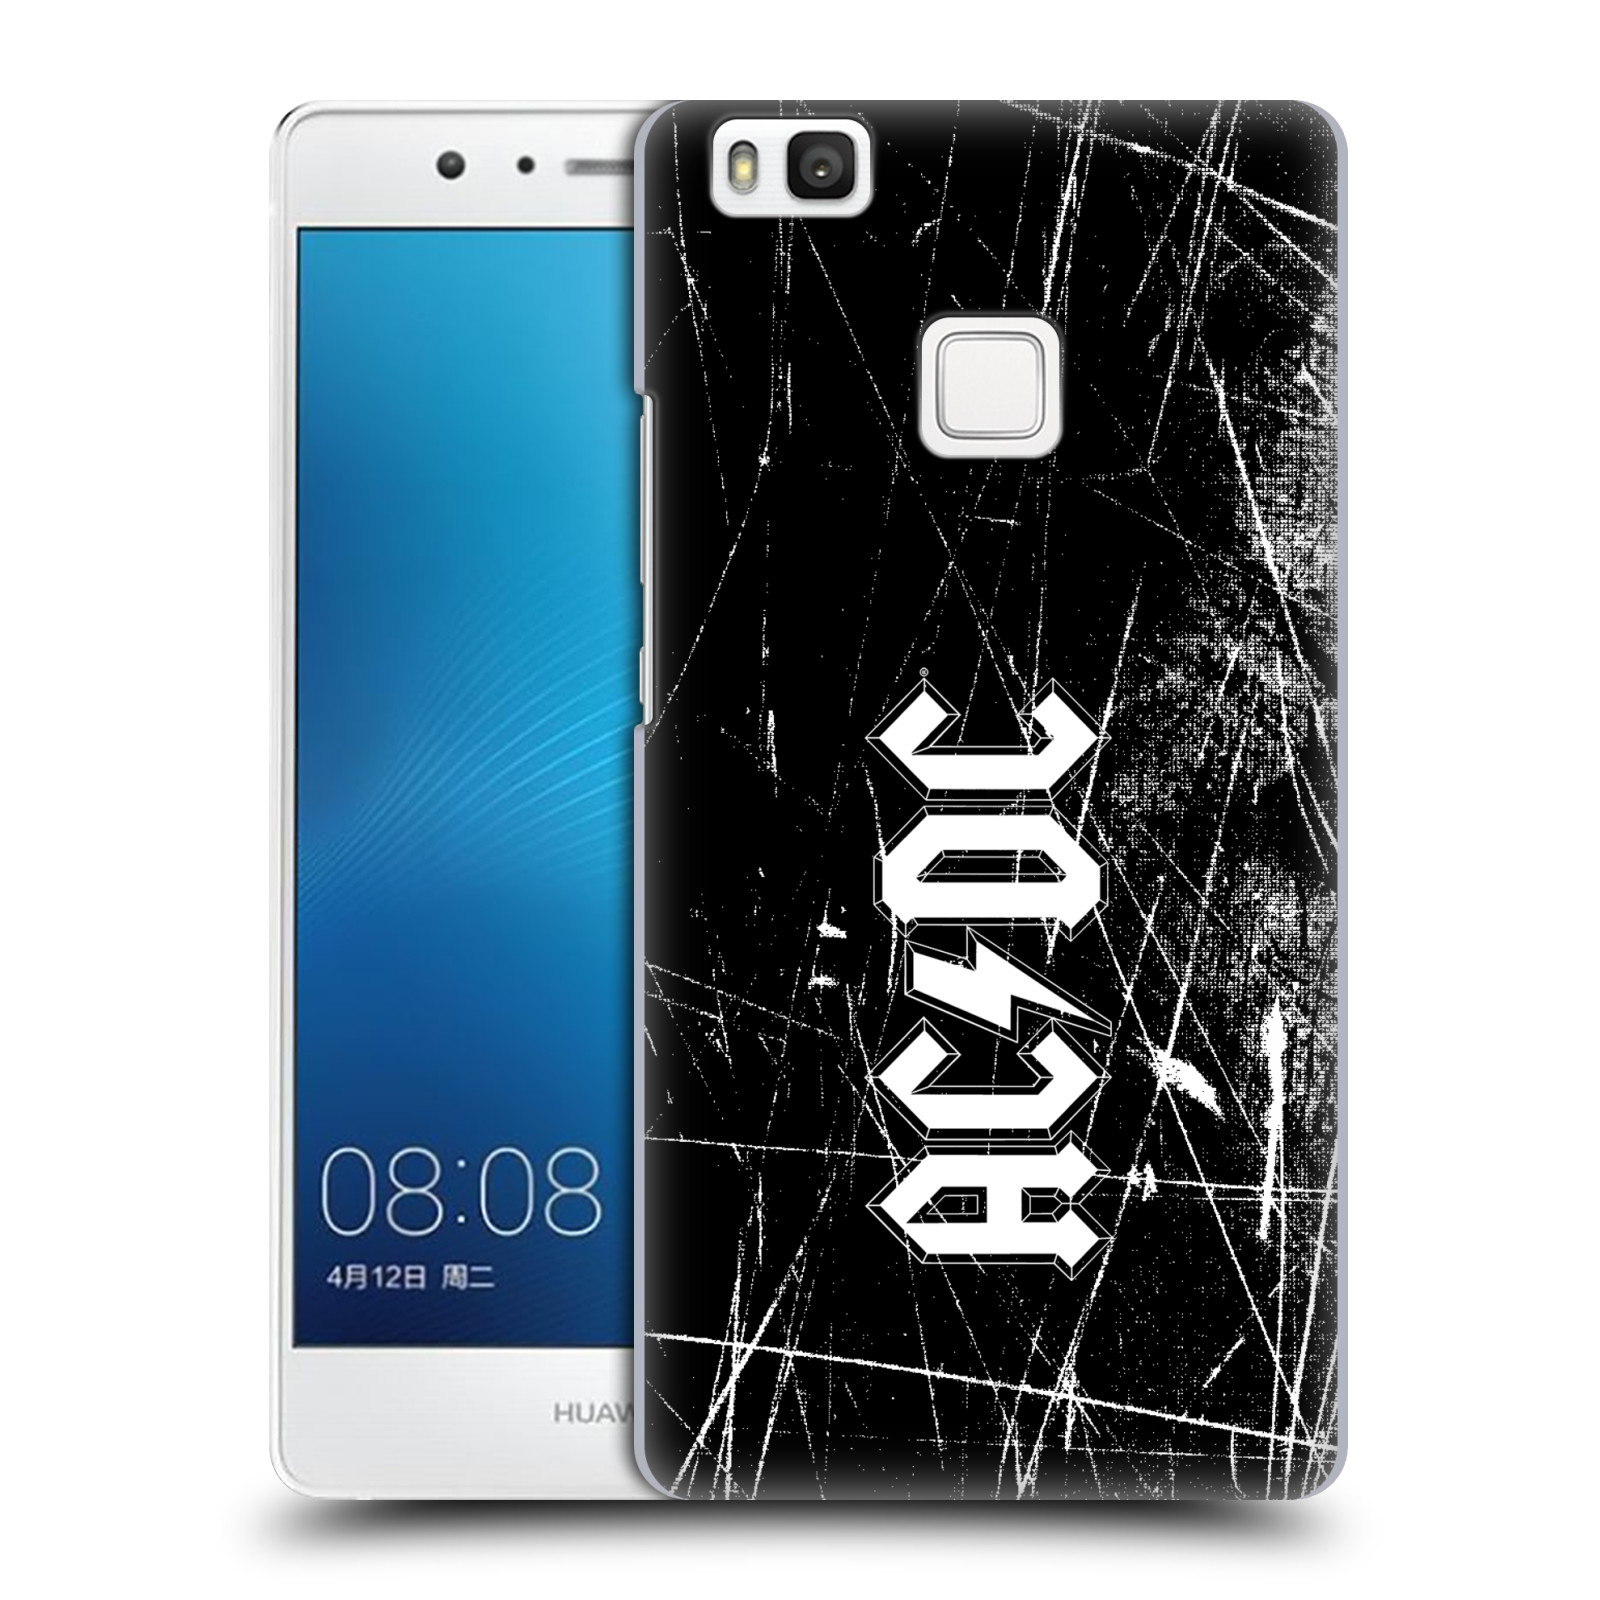 Plastové pouzdro na mobil Huawei P9 Lite HEAD CASE AC/DC Černobílé logo